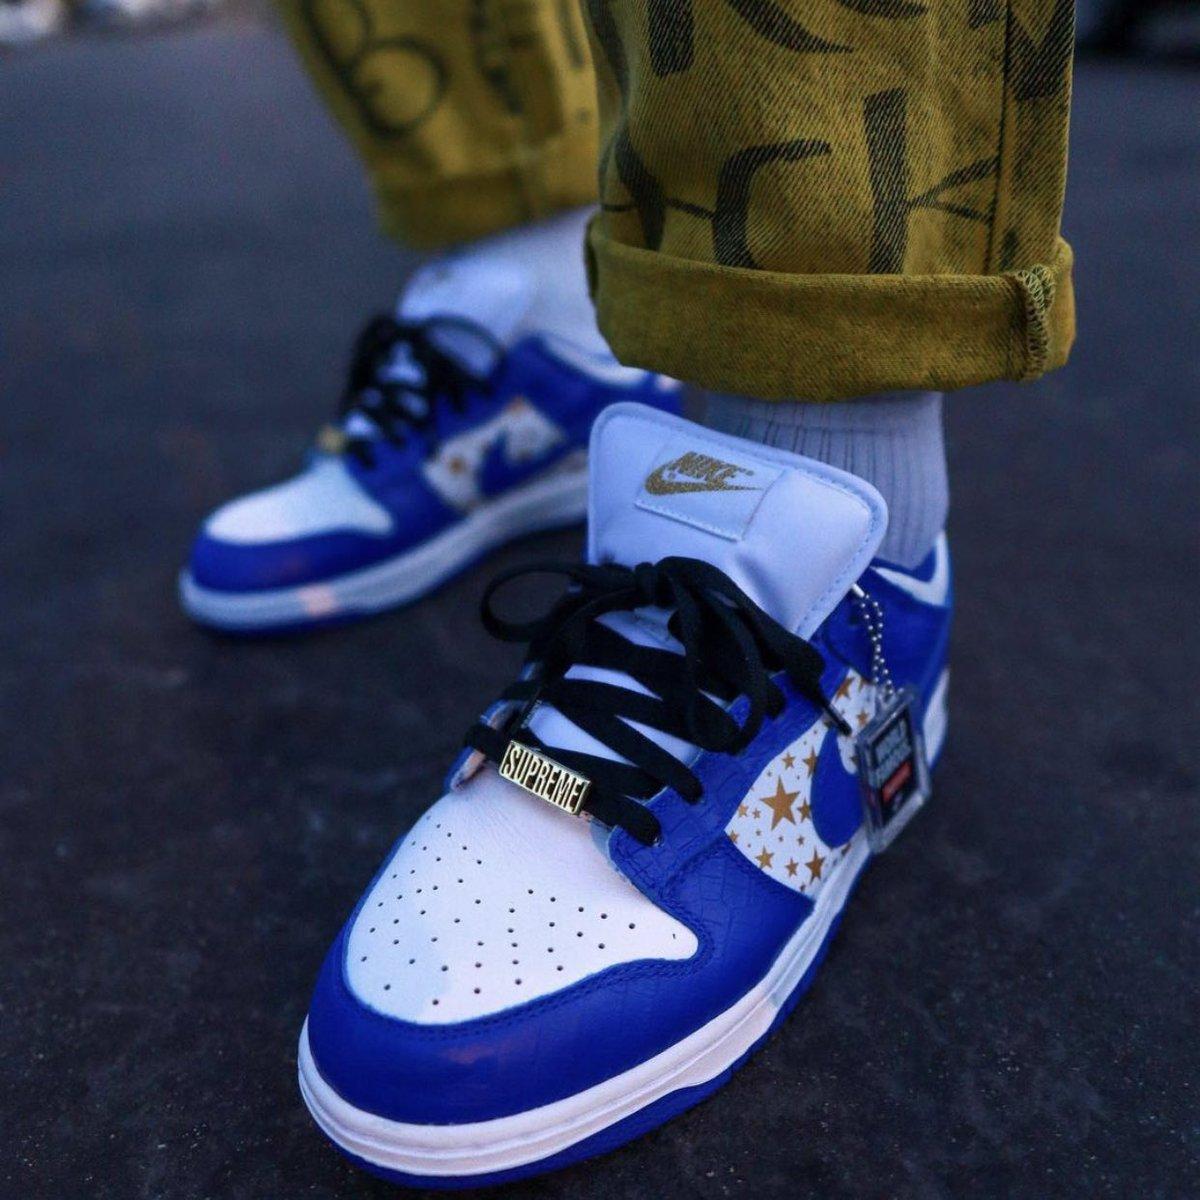 On-Foot Look: Supreme x Nike SB Dunk Low